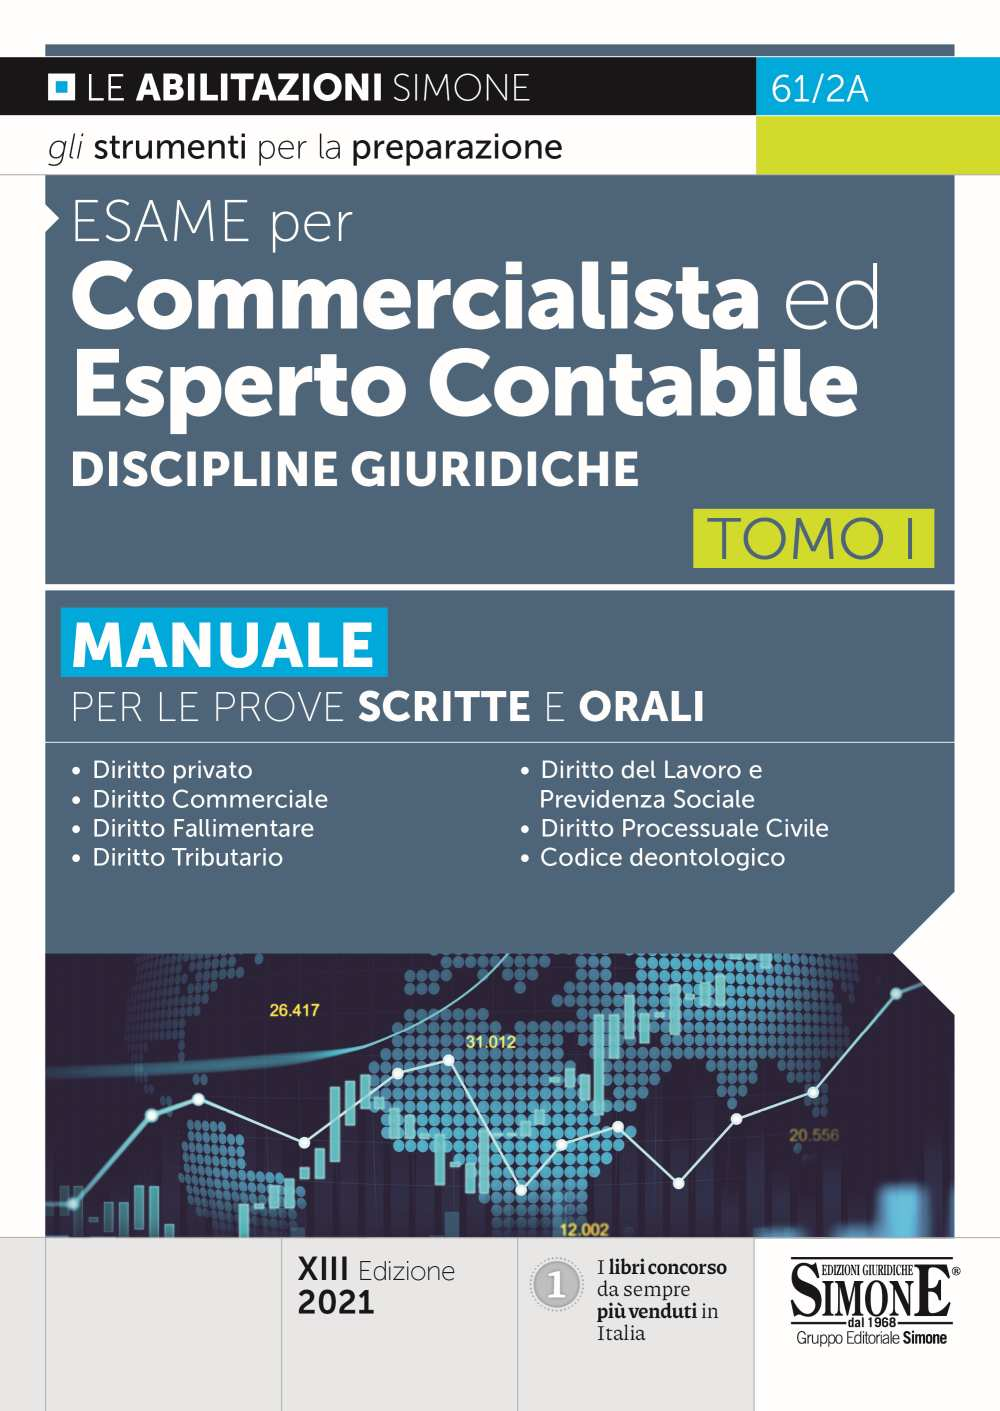 Manuale per Esame Commercialista ed Esperto Contabile